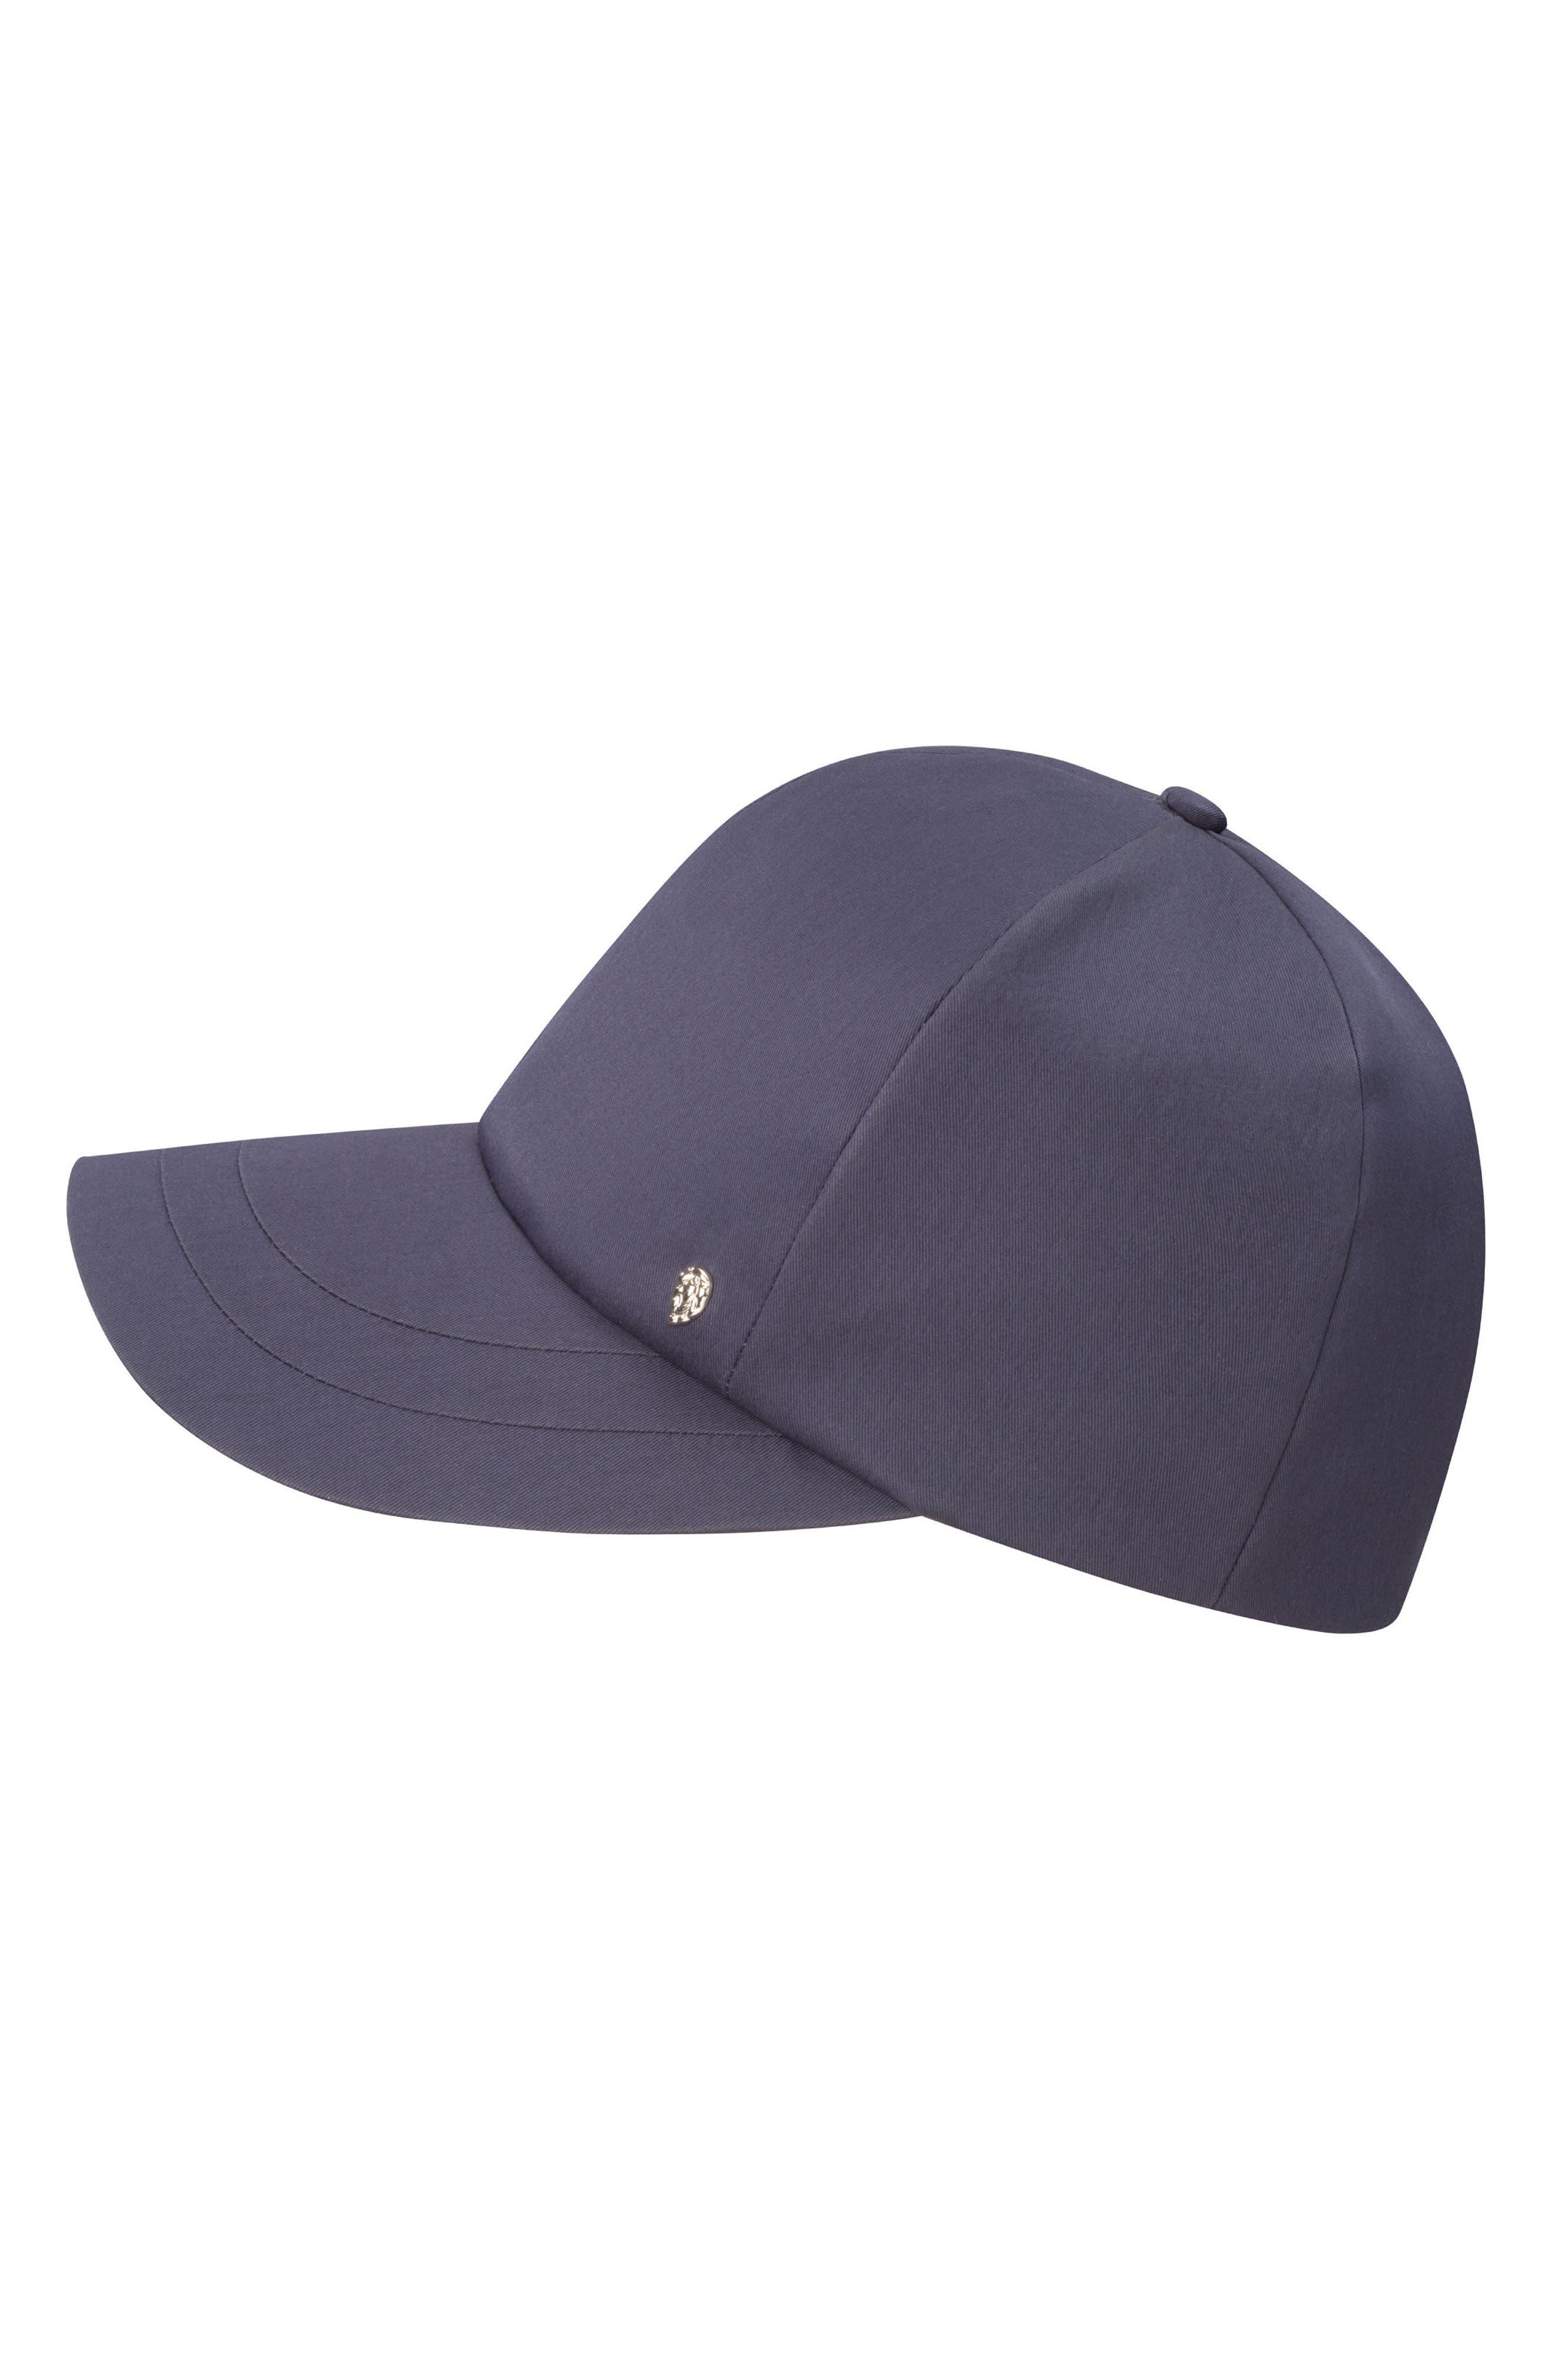 HELEN KAMINSKI WATER RESISTANT BASEBALL CAP - BLUE